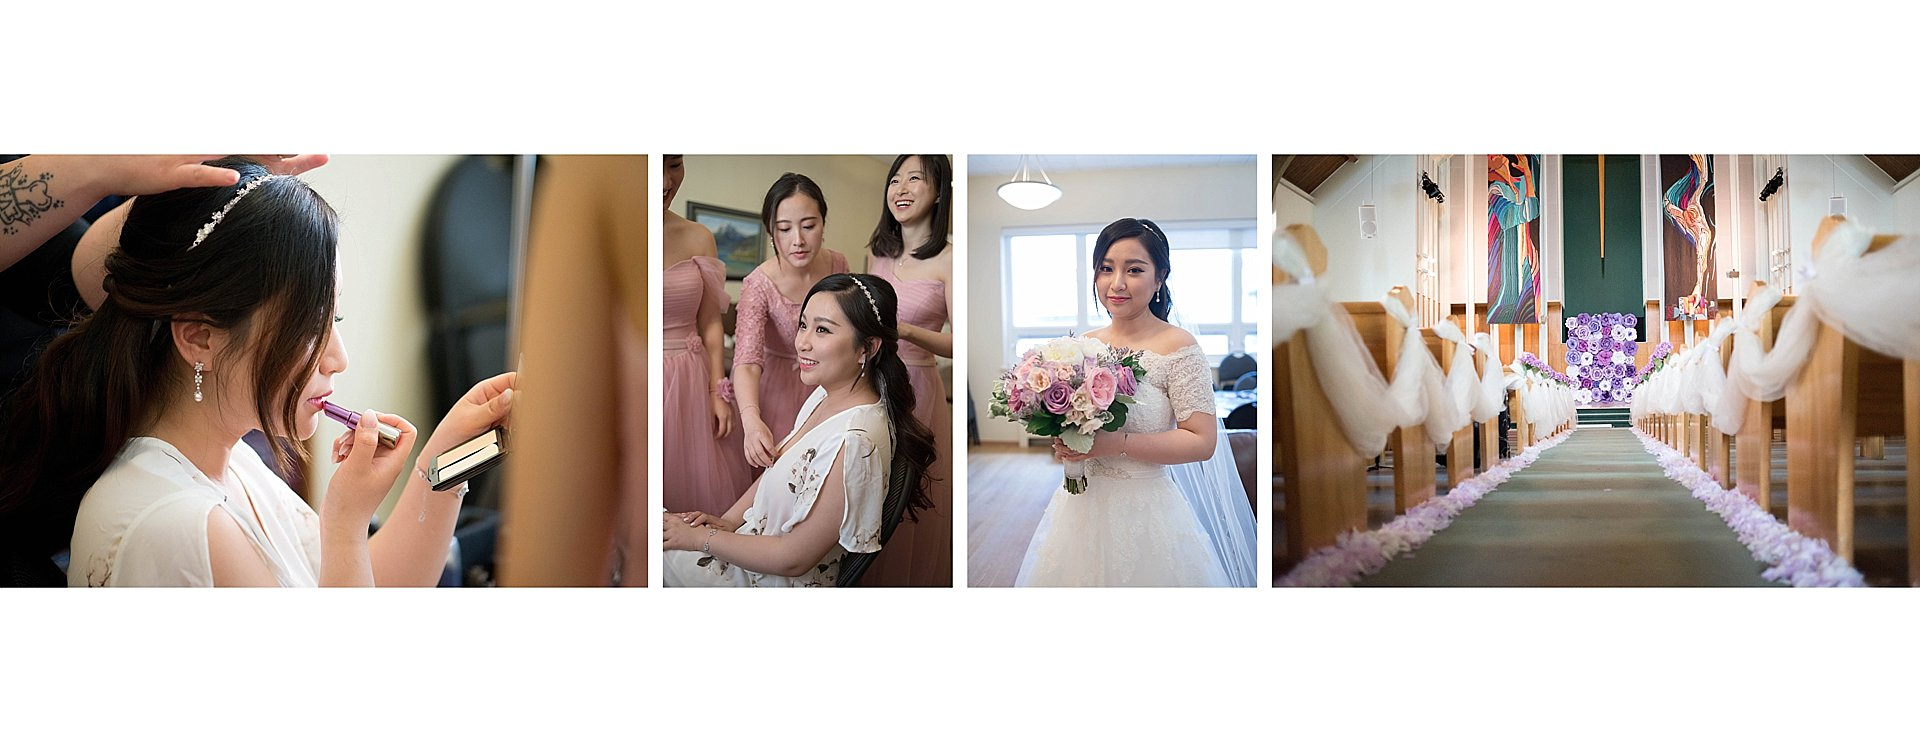 MB-First-Baptist-Church-Edmonton-Wedding-_0004